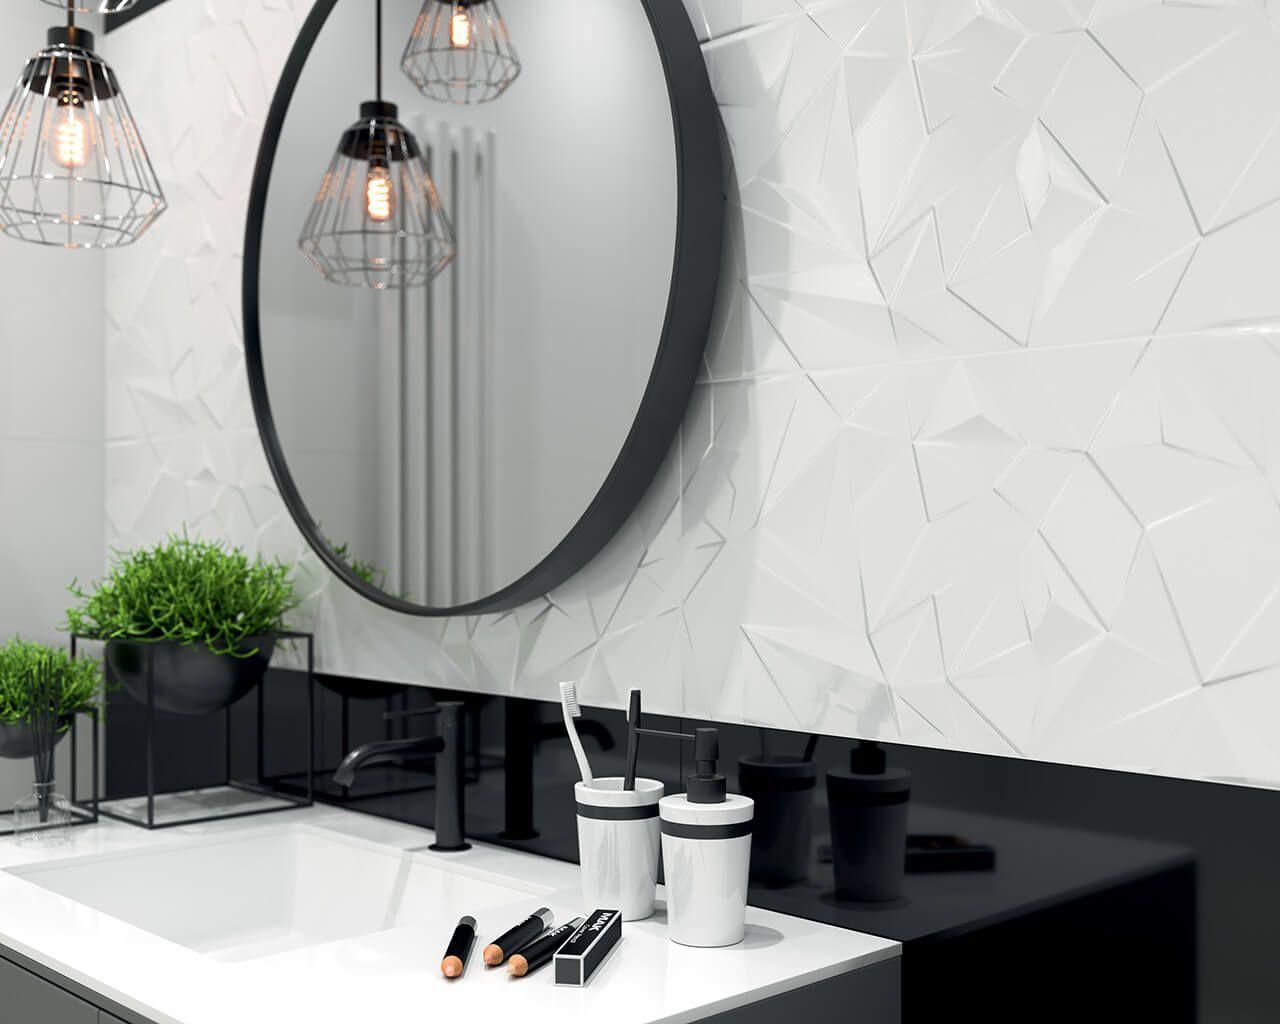 Synergy Nowoczesna Faktura I Minimalistyczne Wzor Symetry Nowoczesne Szarosci I Kremowe Barwy Ceramika P White Bathroom Black White Bathrooms House Tiles